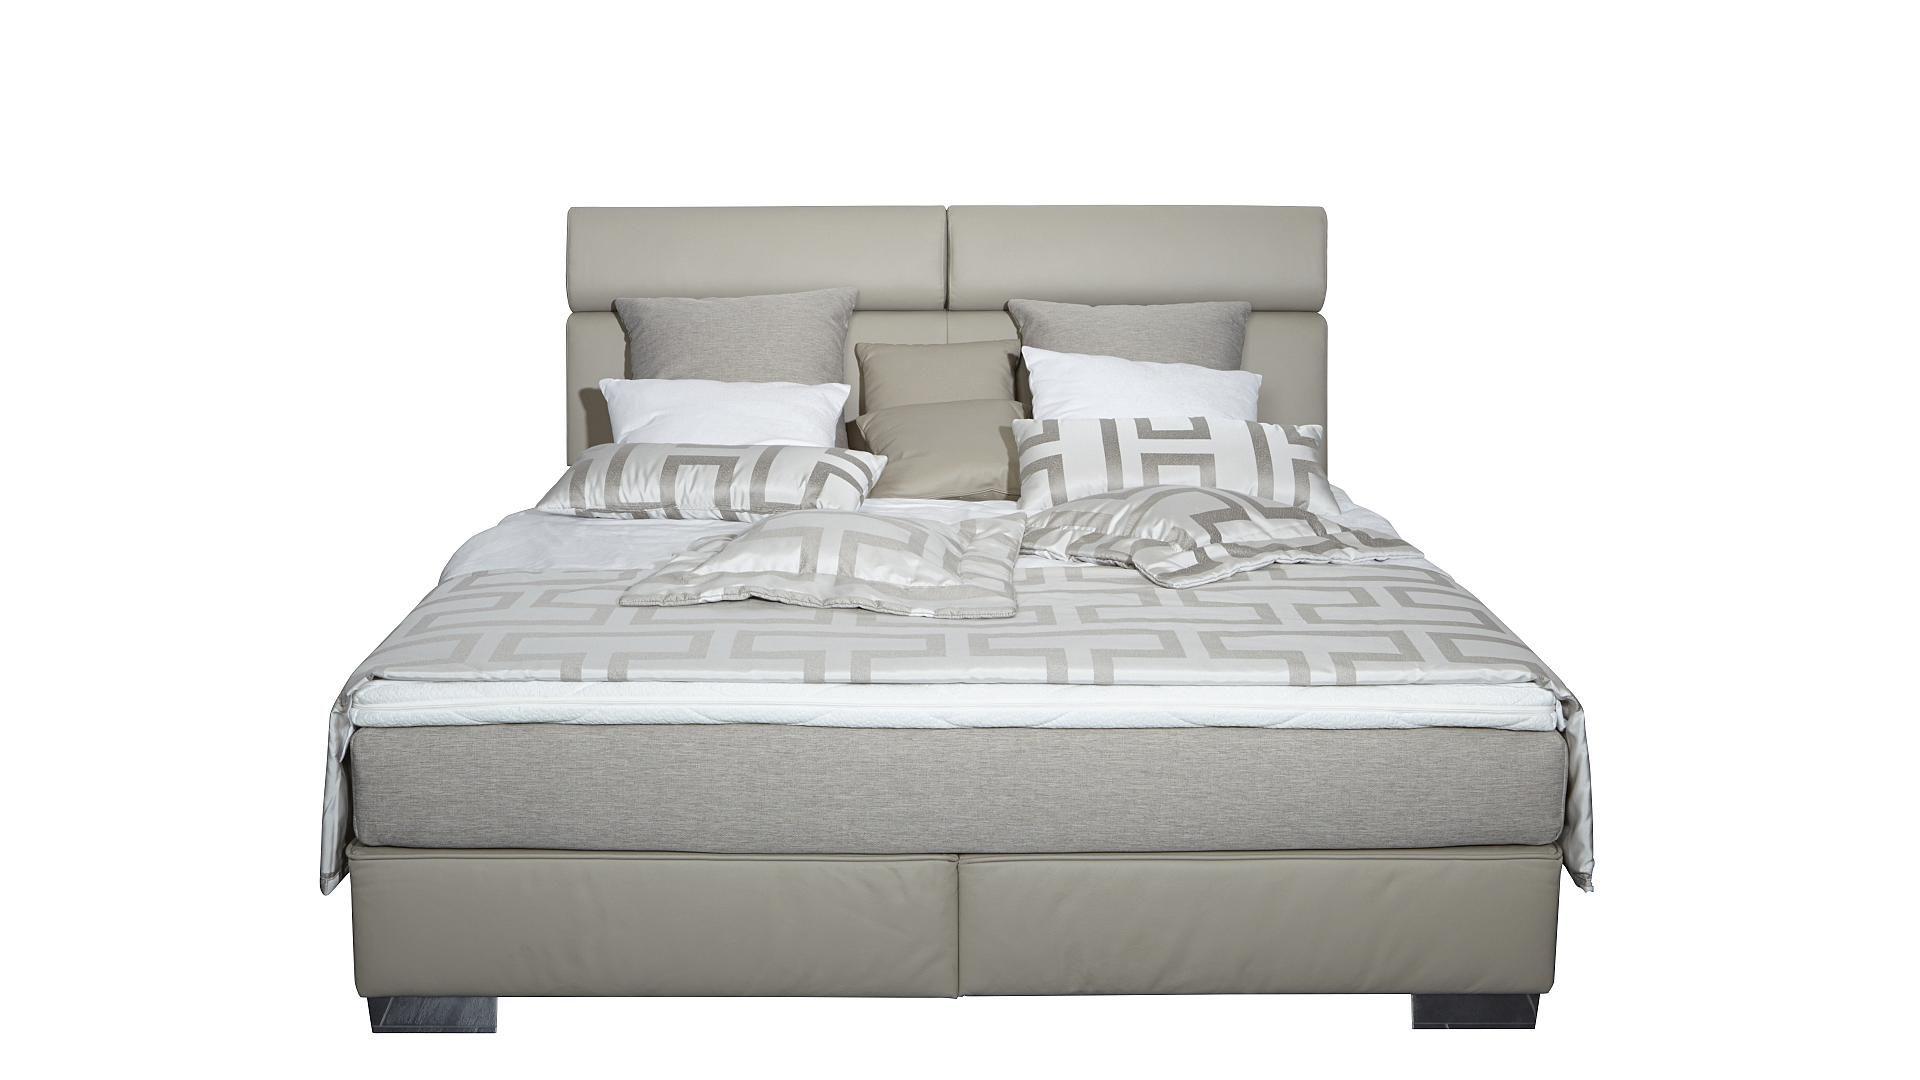 die besten 25 boxspringbett leder ideen auf pinterest amerikanisches boxspringbett. Black Bedroom Furniture Sets. Home Design Ideas